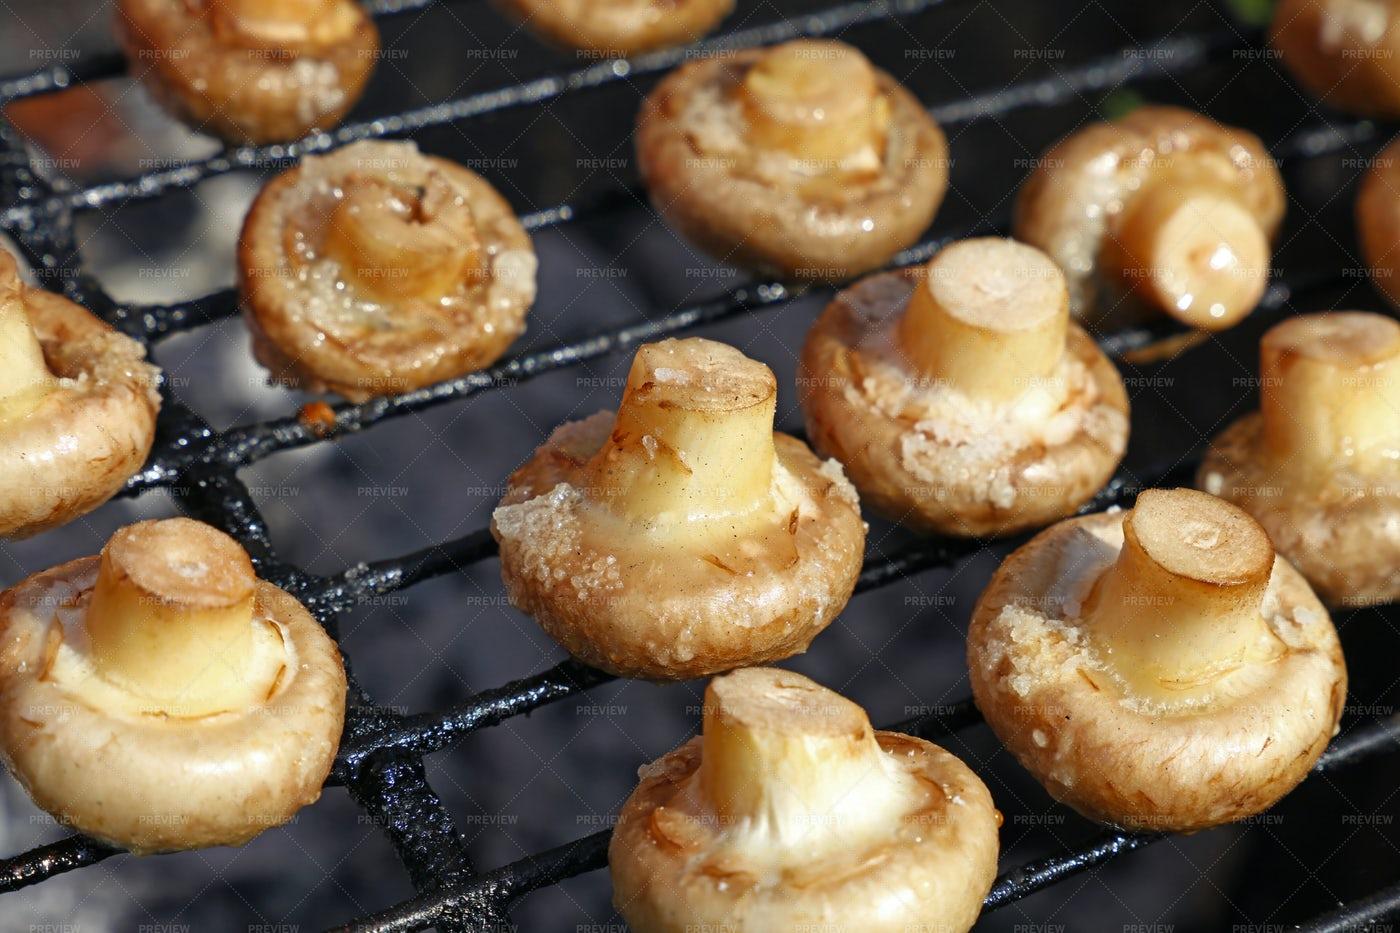 Champignons Mushrooms On Grill: Stock Photos